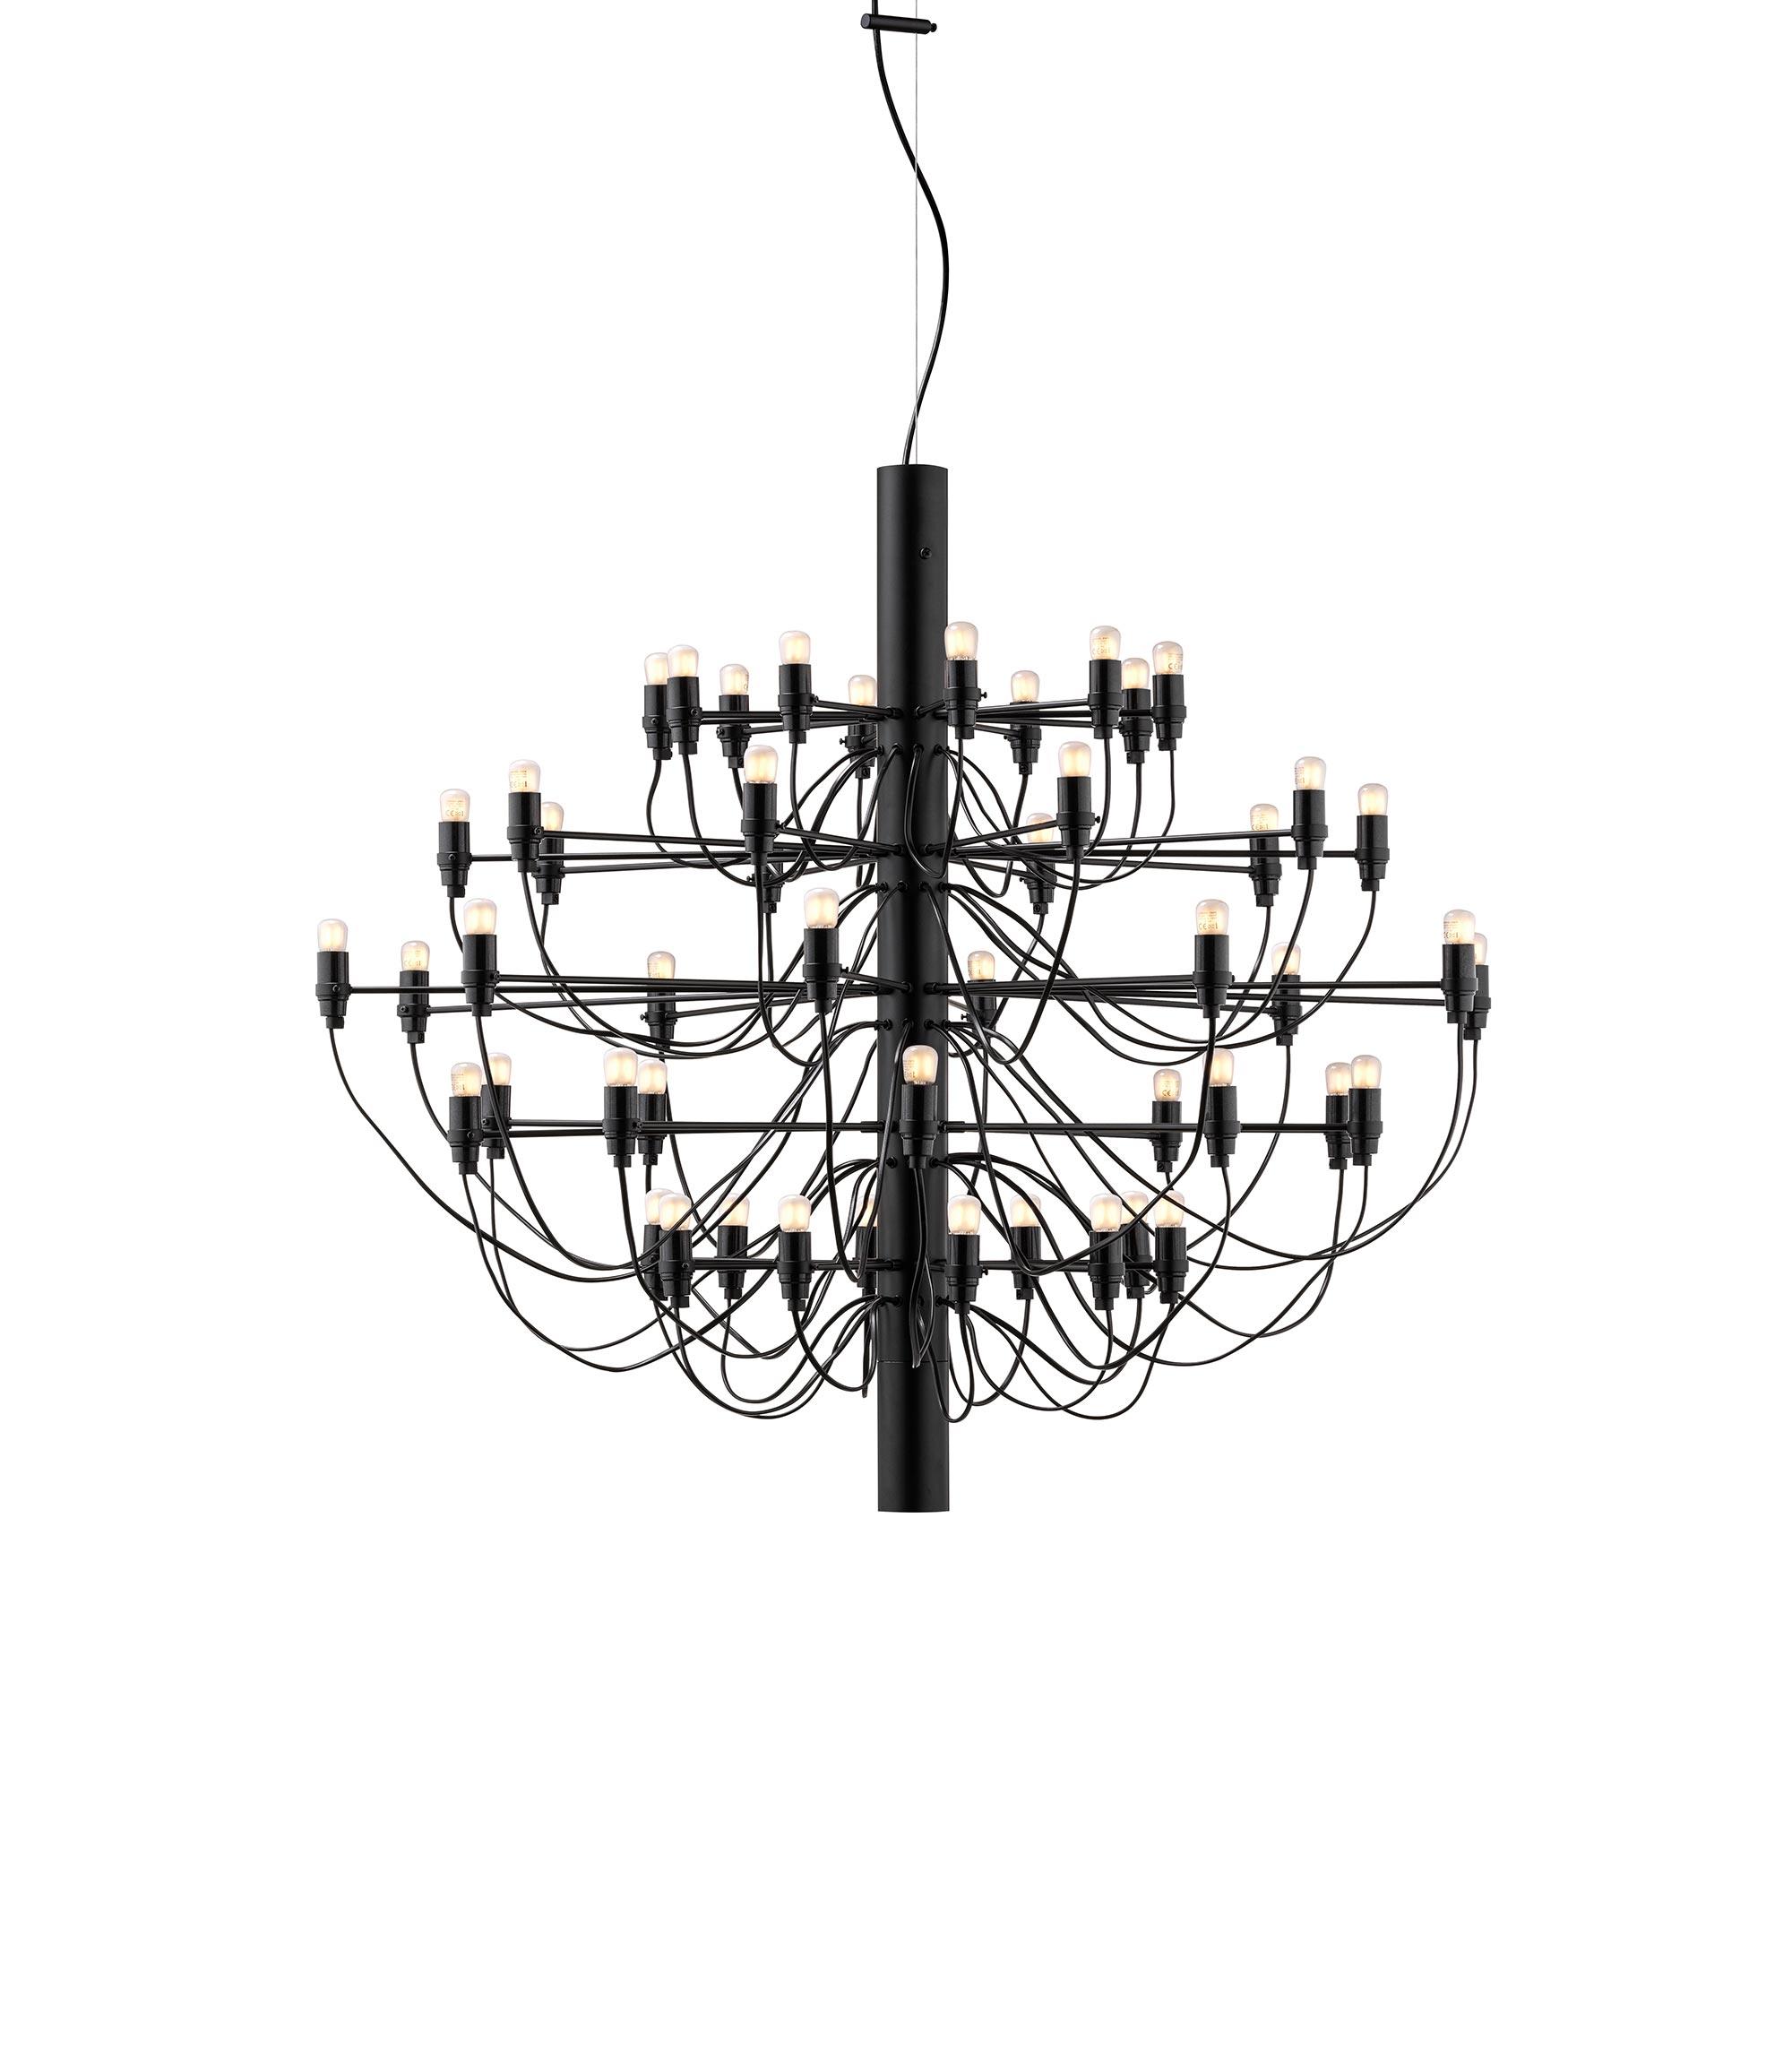 Flos (RU) Подвесной светильник 2097/50 Frosted bulbs от бренда Flos